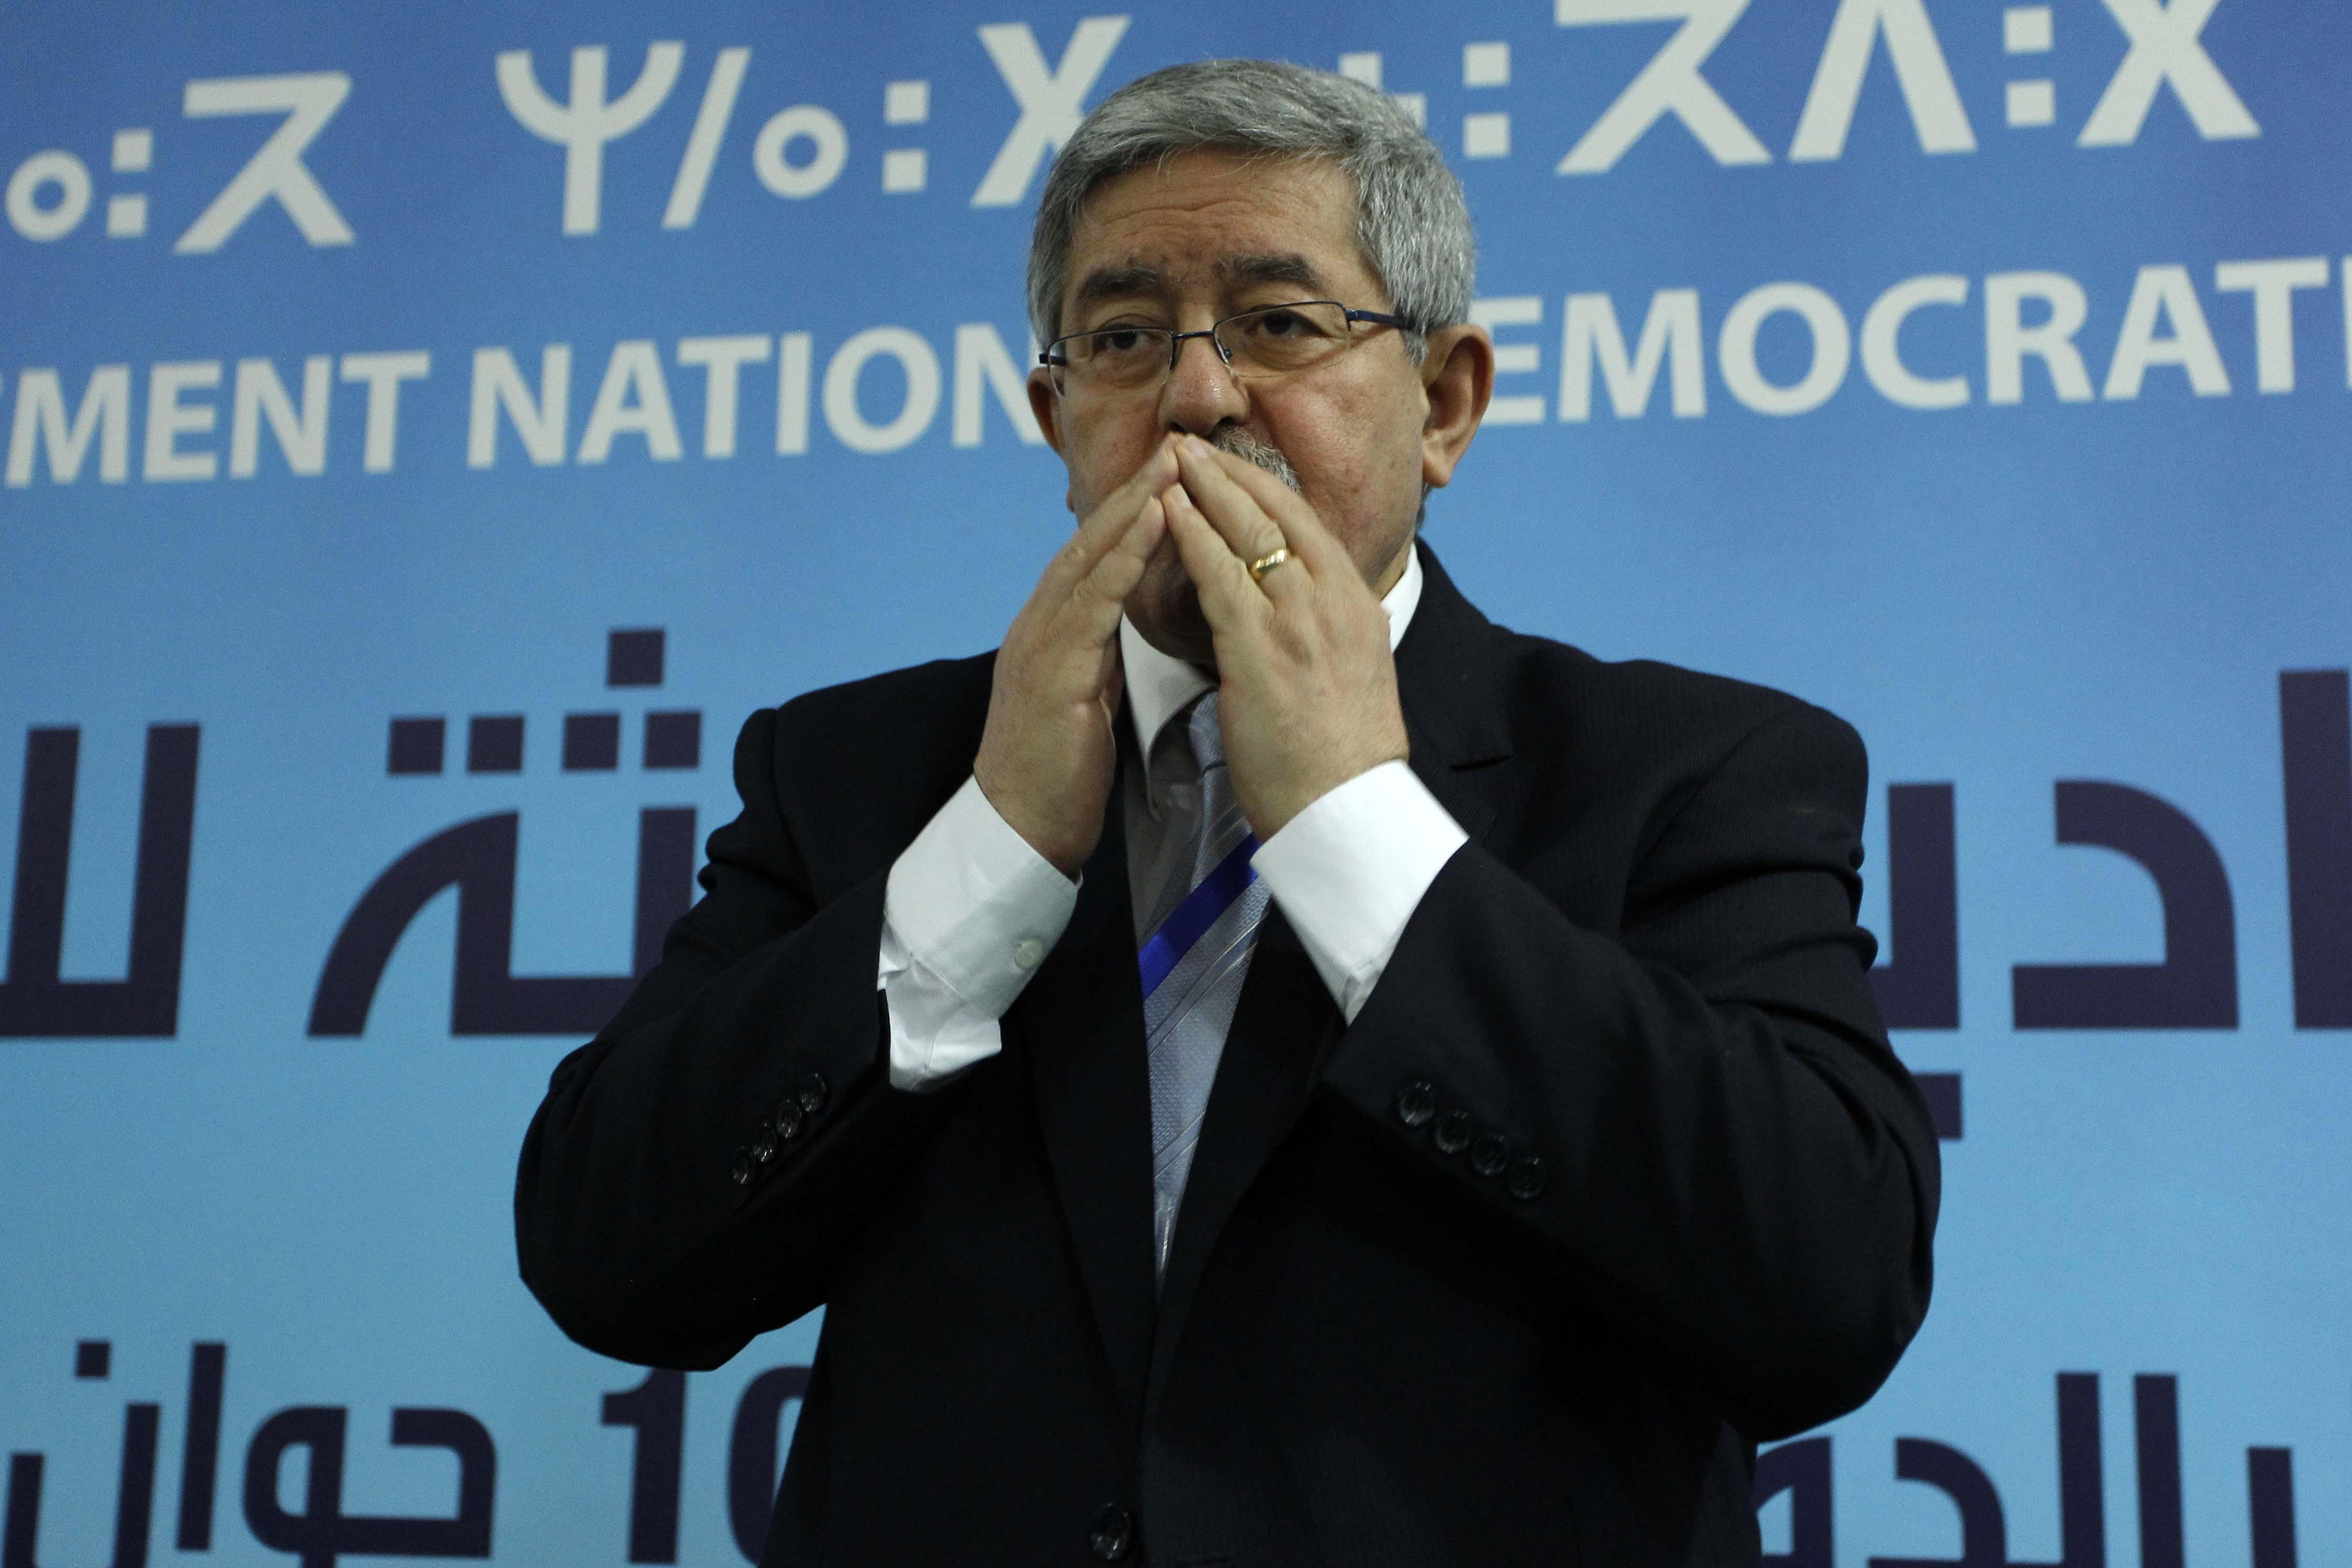 Ahmed Ouyahia, aujourd'hui, lors du conseil national du RND. New Press